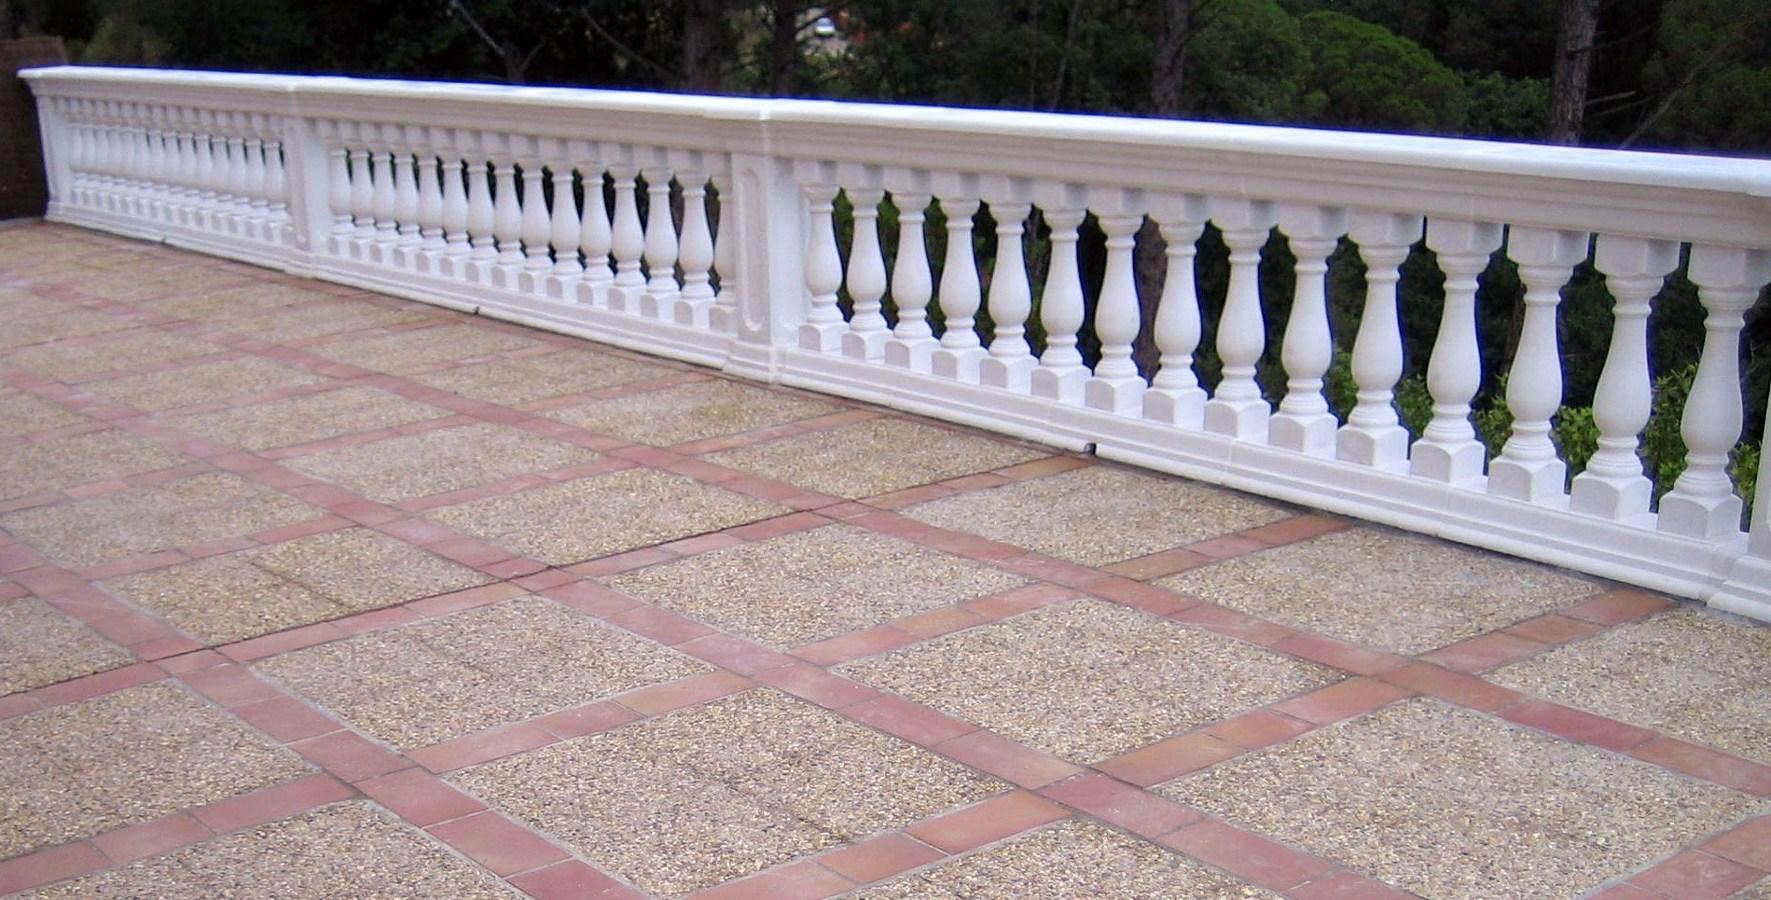 realizacion de balustradas y pavimentos